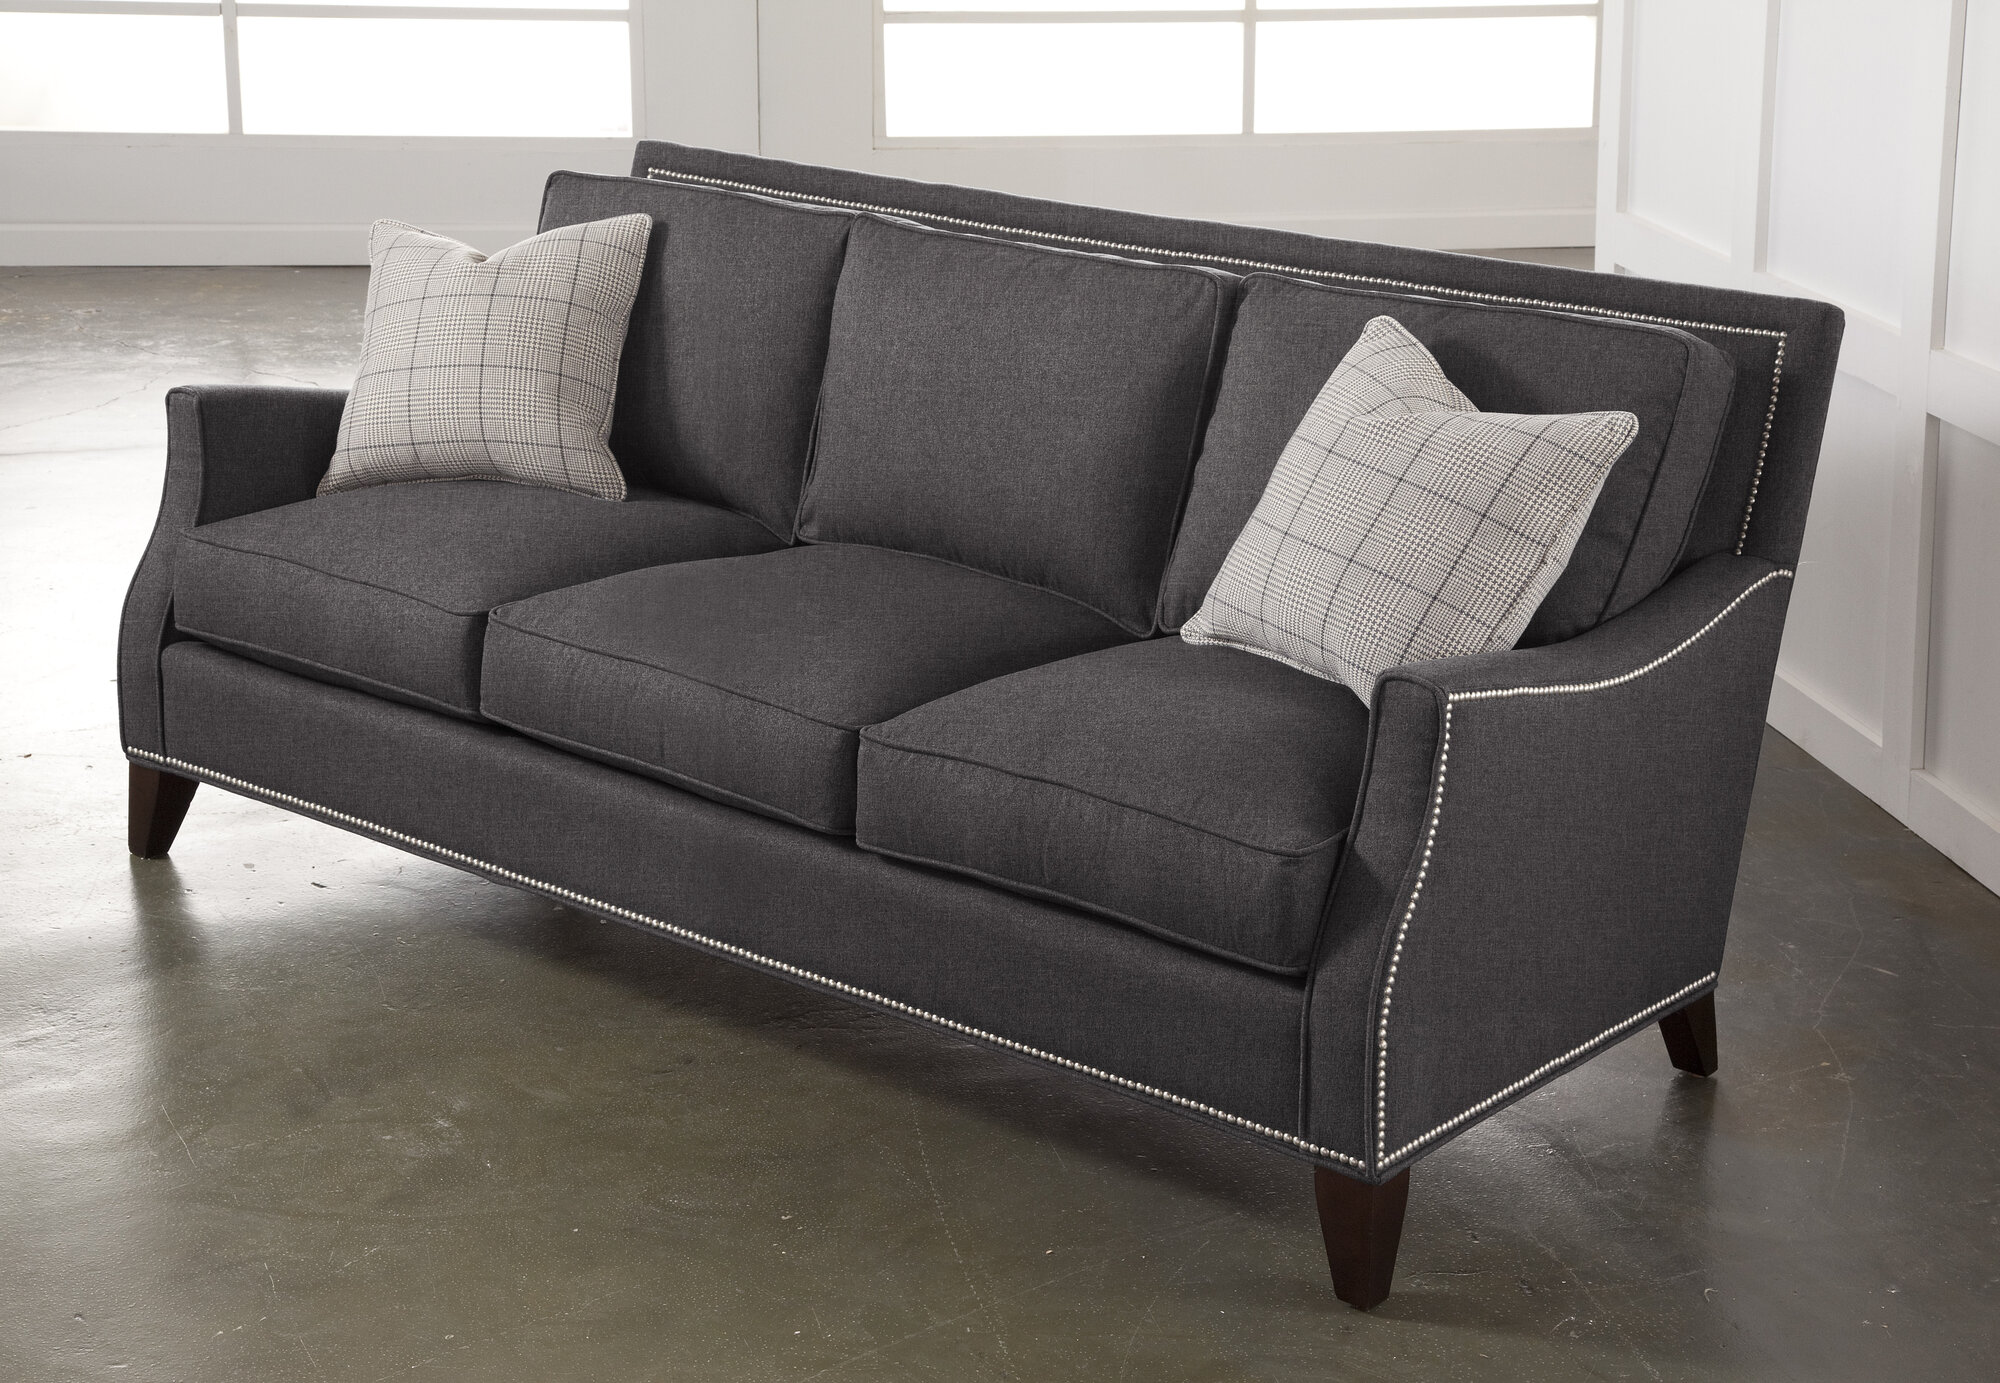 http://img2.wfrcdn.com/lf/8/hash/25281/9400059/1/Libby-Langdon-Upholstery-Haynes-Sofa.jpg